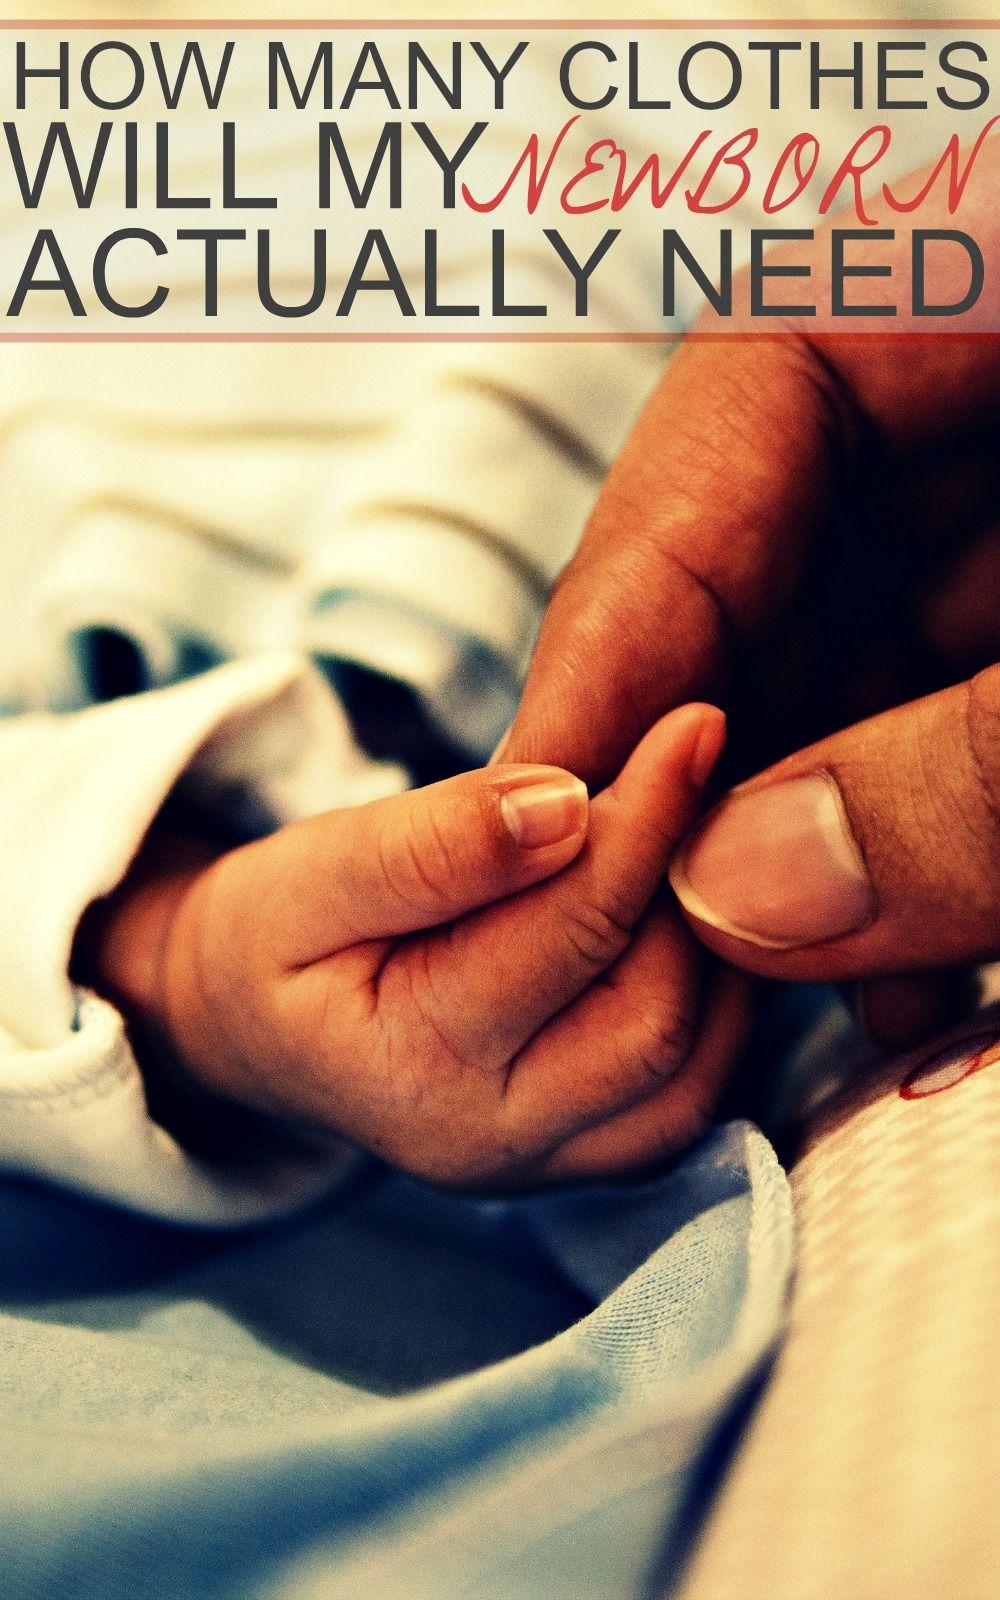 How Many Clothes Does My Newborn Need | Newborn needs ...